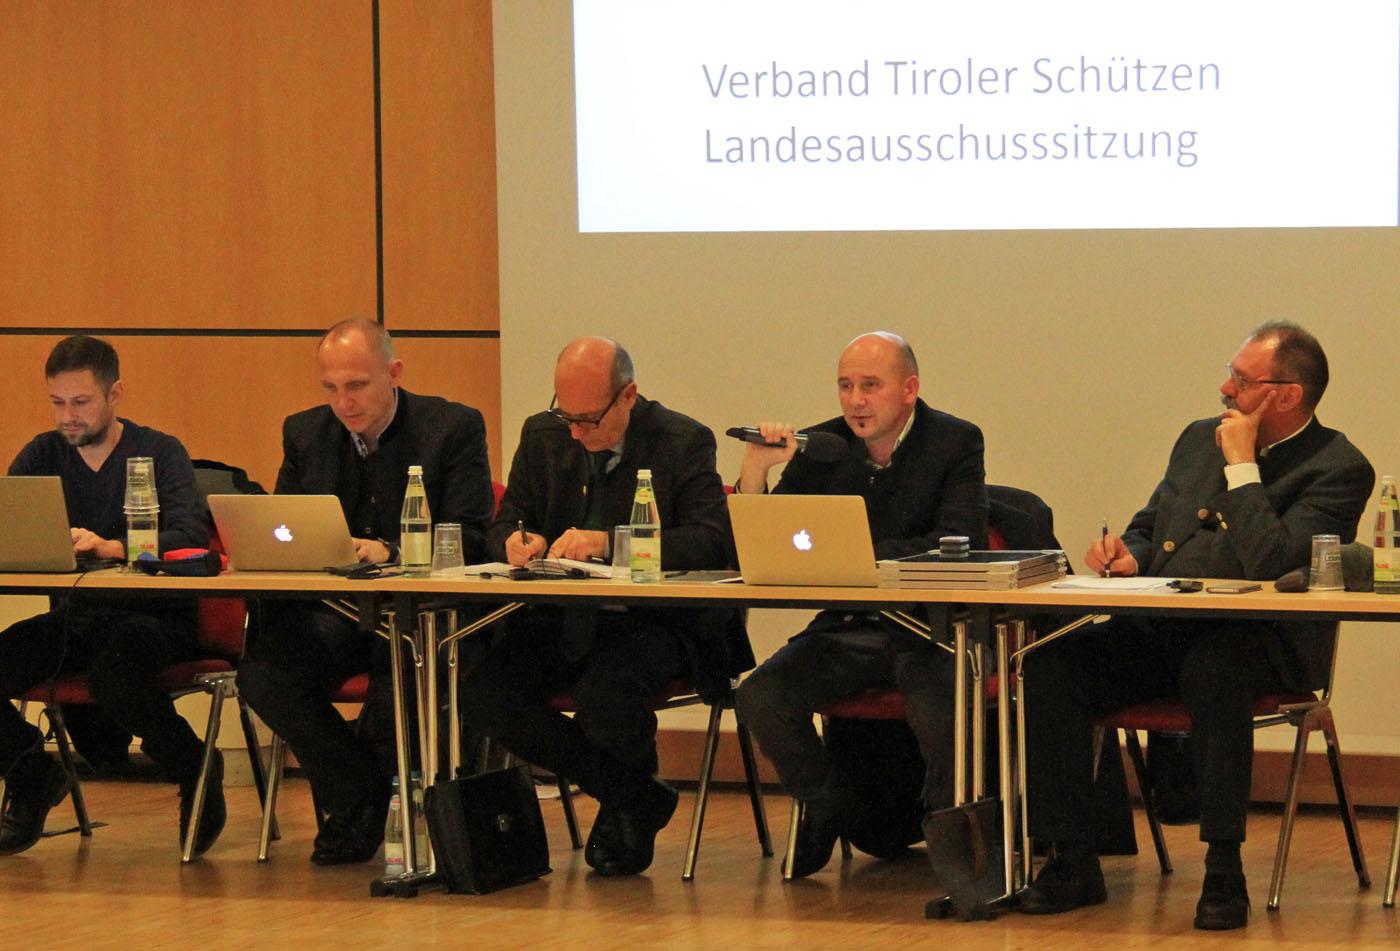 Tiroler Schützen gemeinsam für Tirol